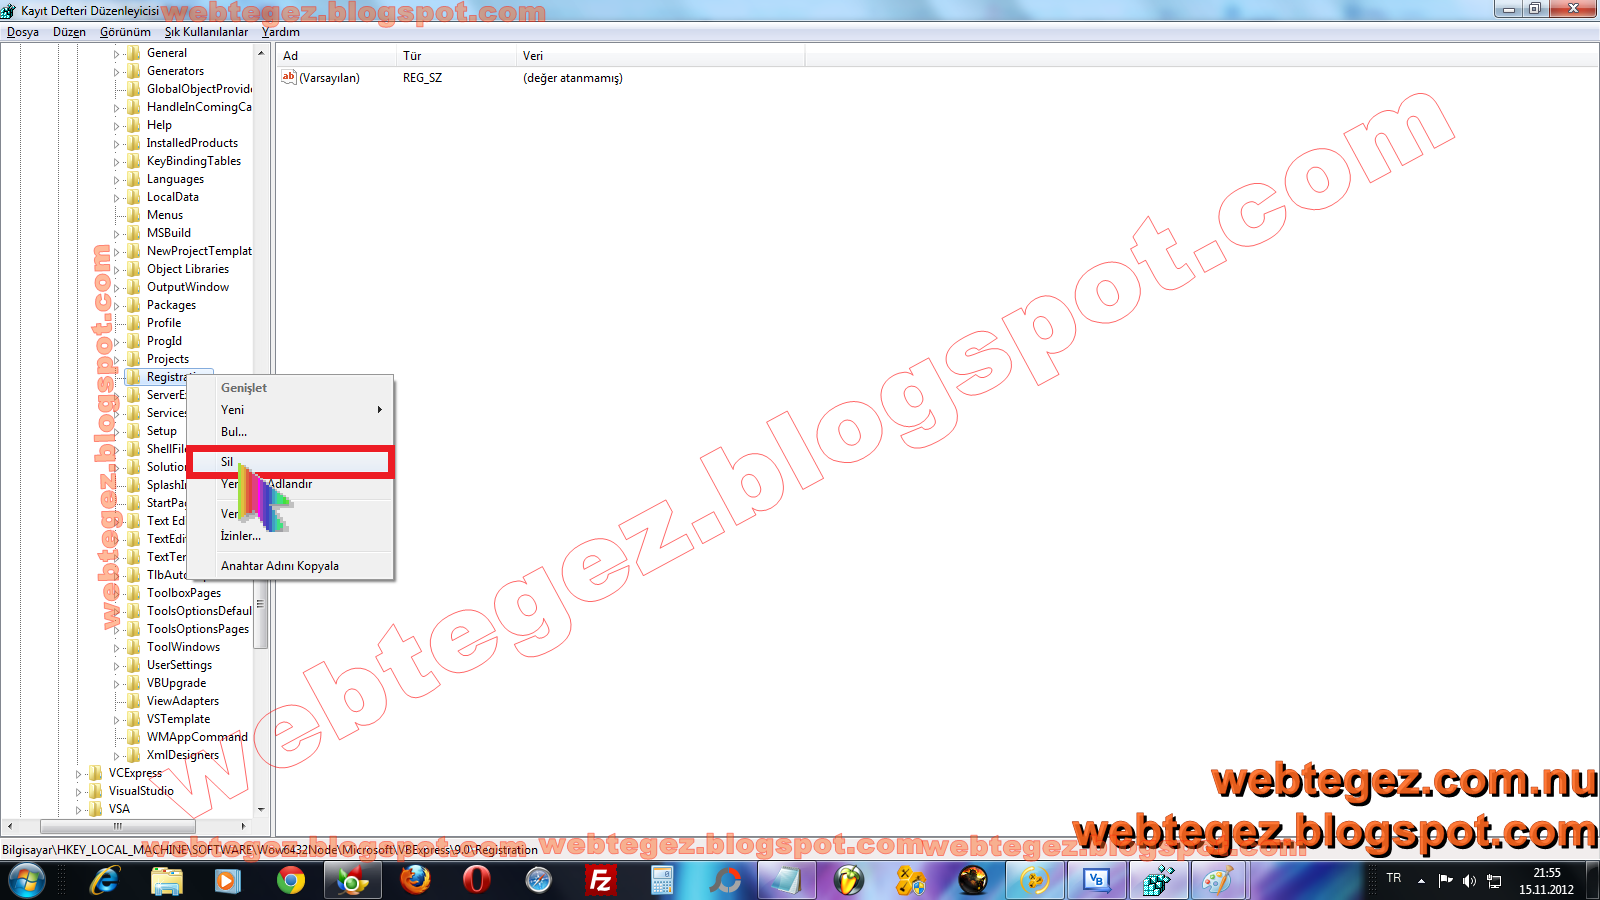 visual studio 2008 license key registry